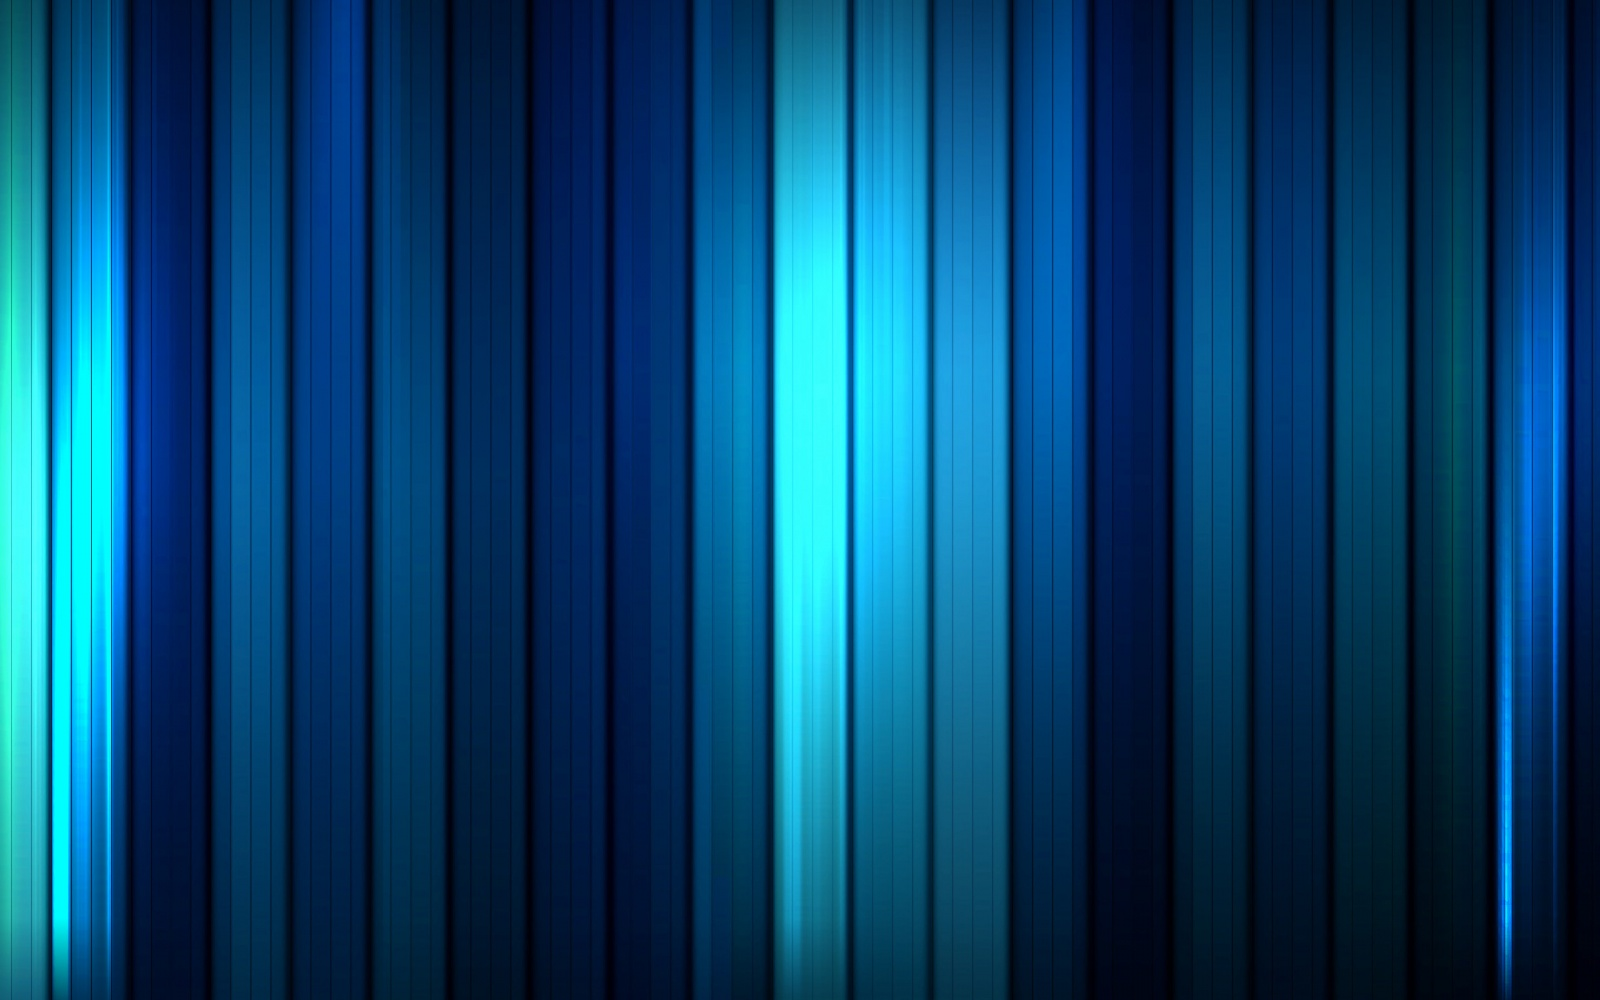 top desktop blue wallpapers blue wallpaper blue background hd 33jpg 1600x1000